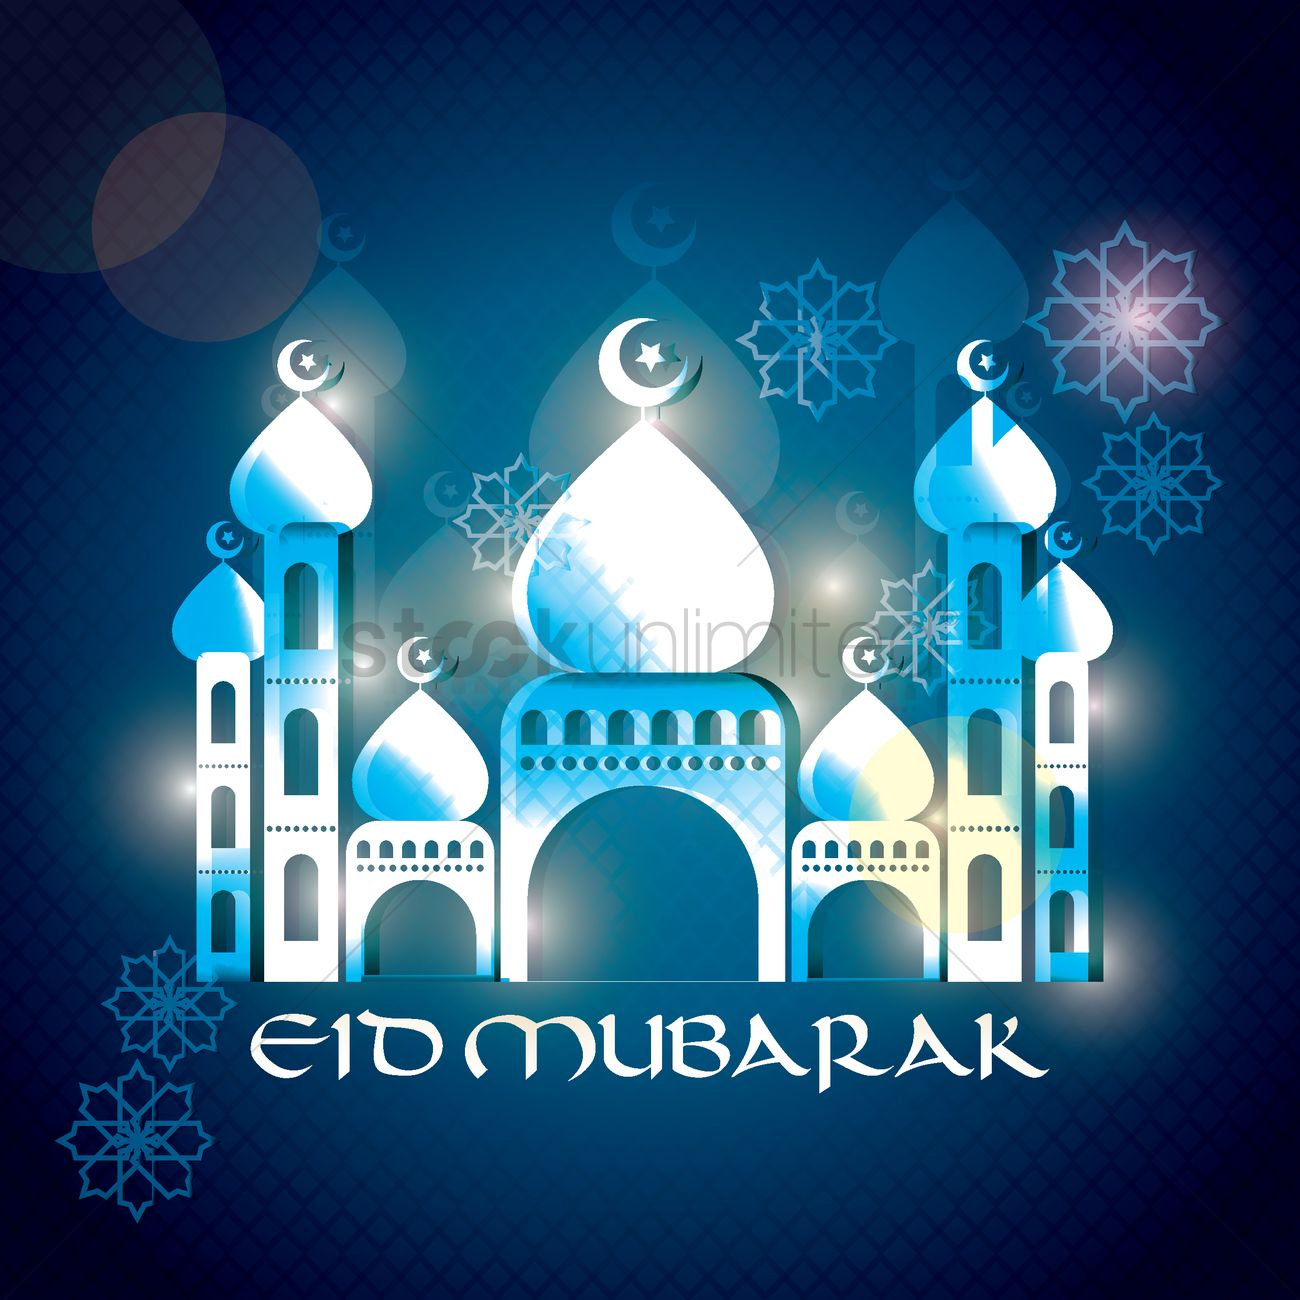 Eid Mubarak Greeting Vector Image 1828213 Stockunlimited